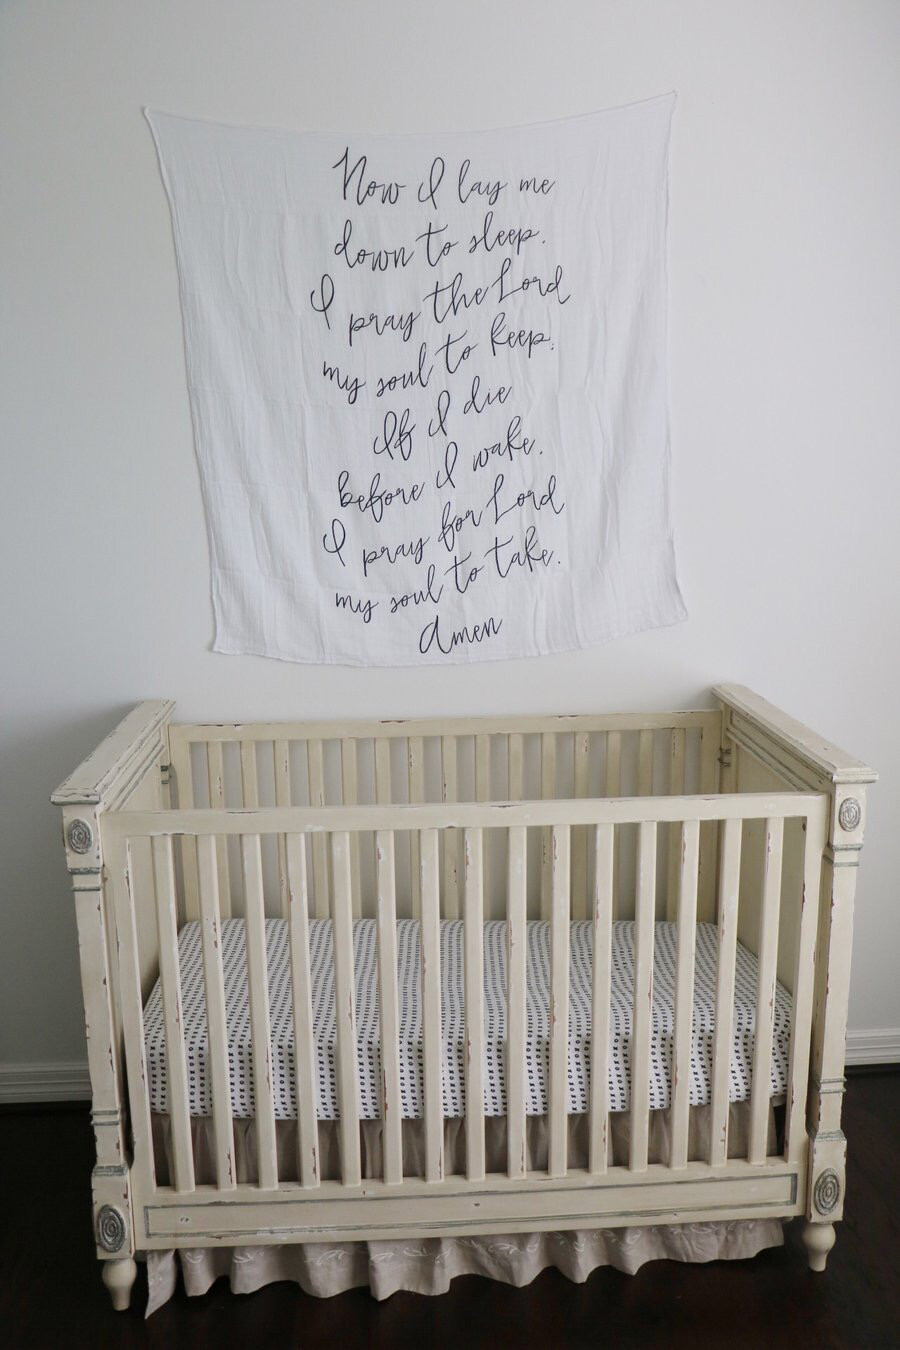 Organic Swaddle Blanket- Now I lay me prayer